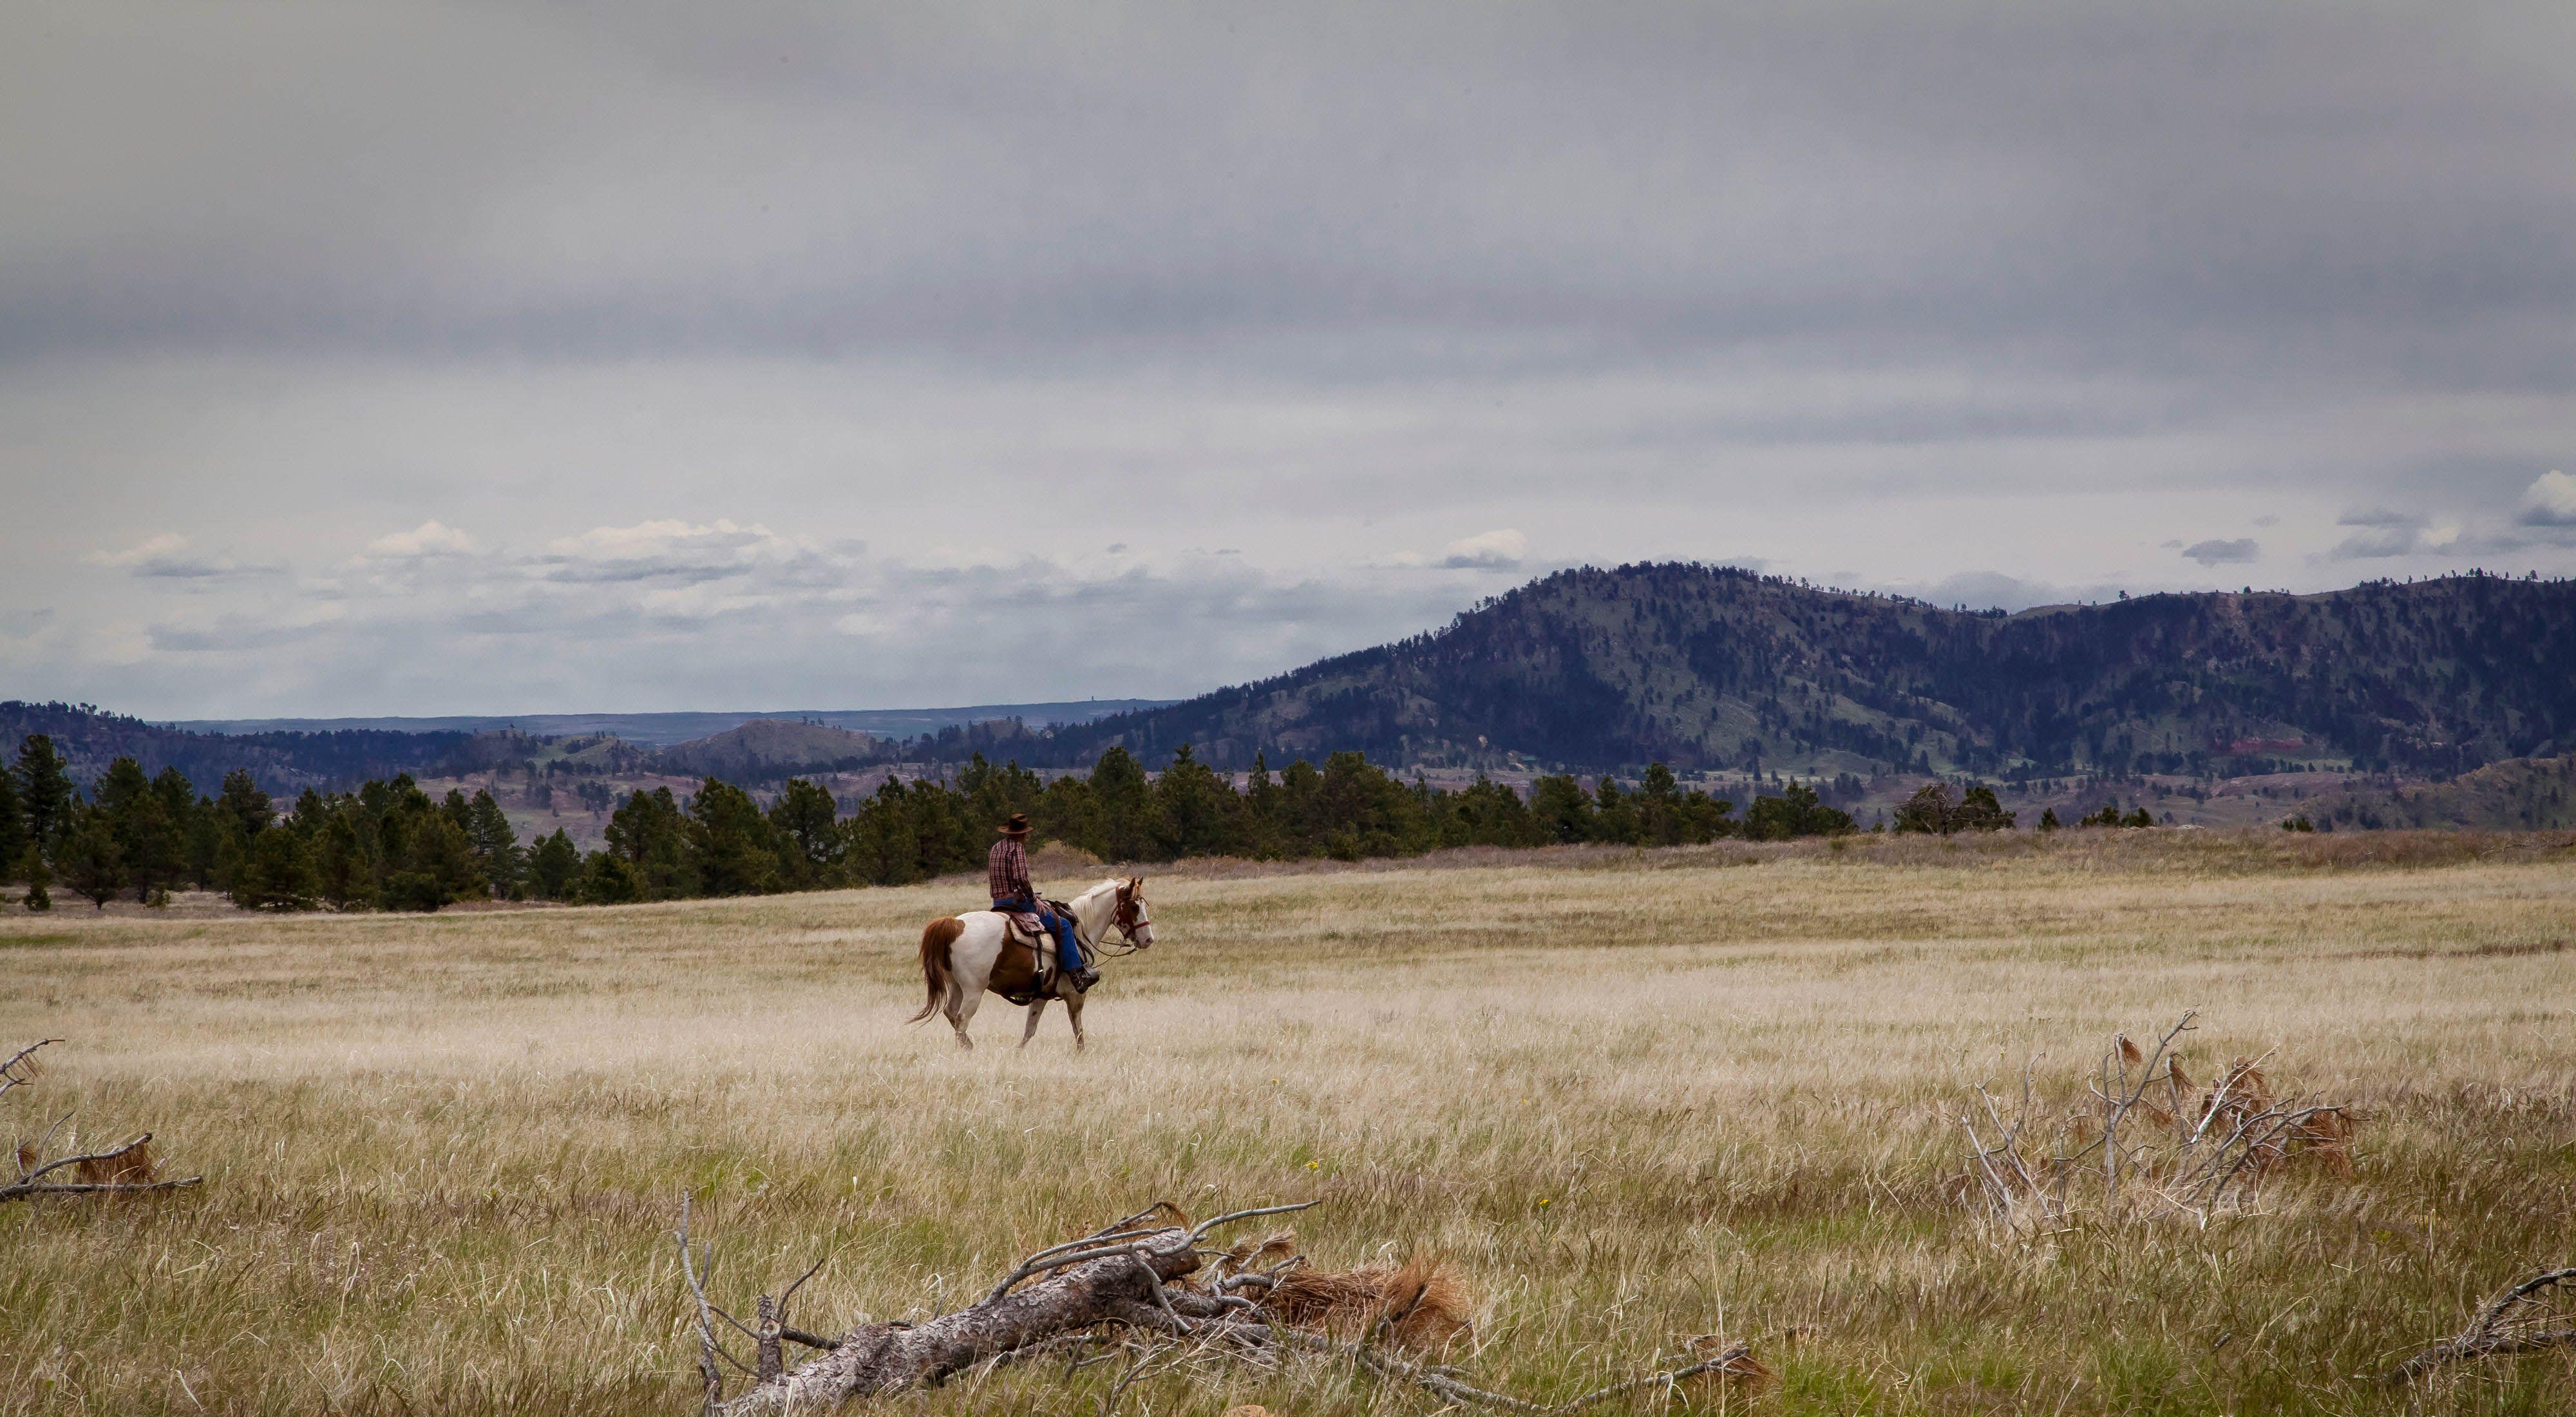 A person rides a horse through the Black Hills grasslands.